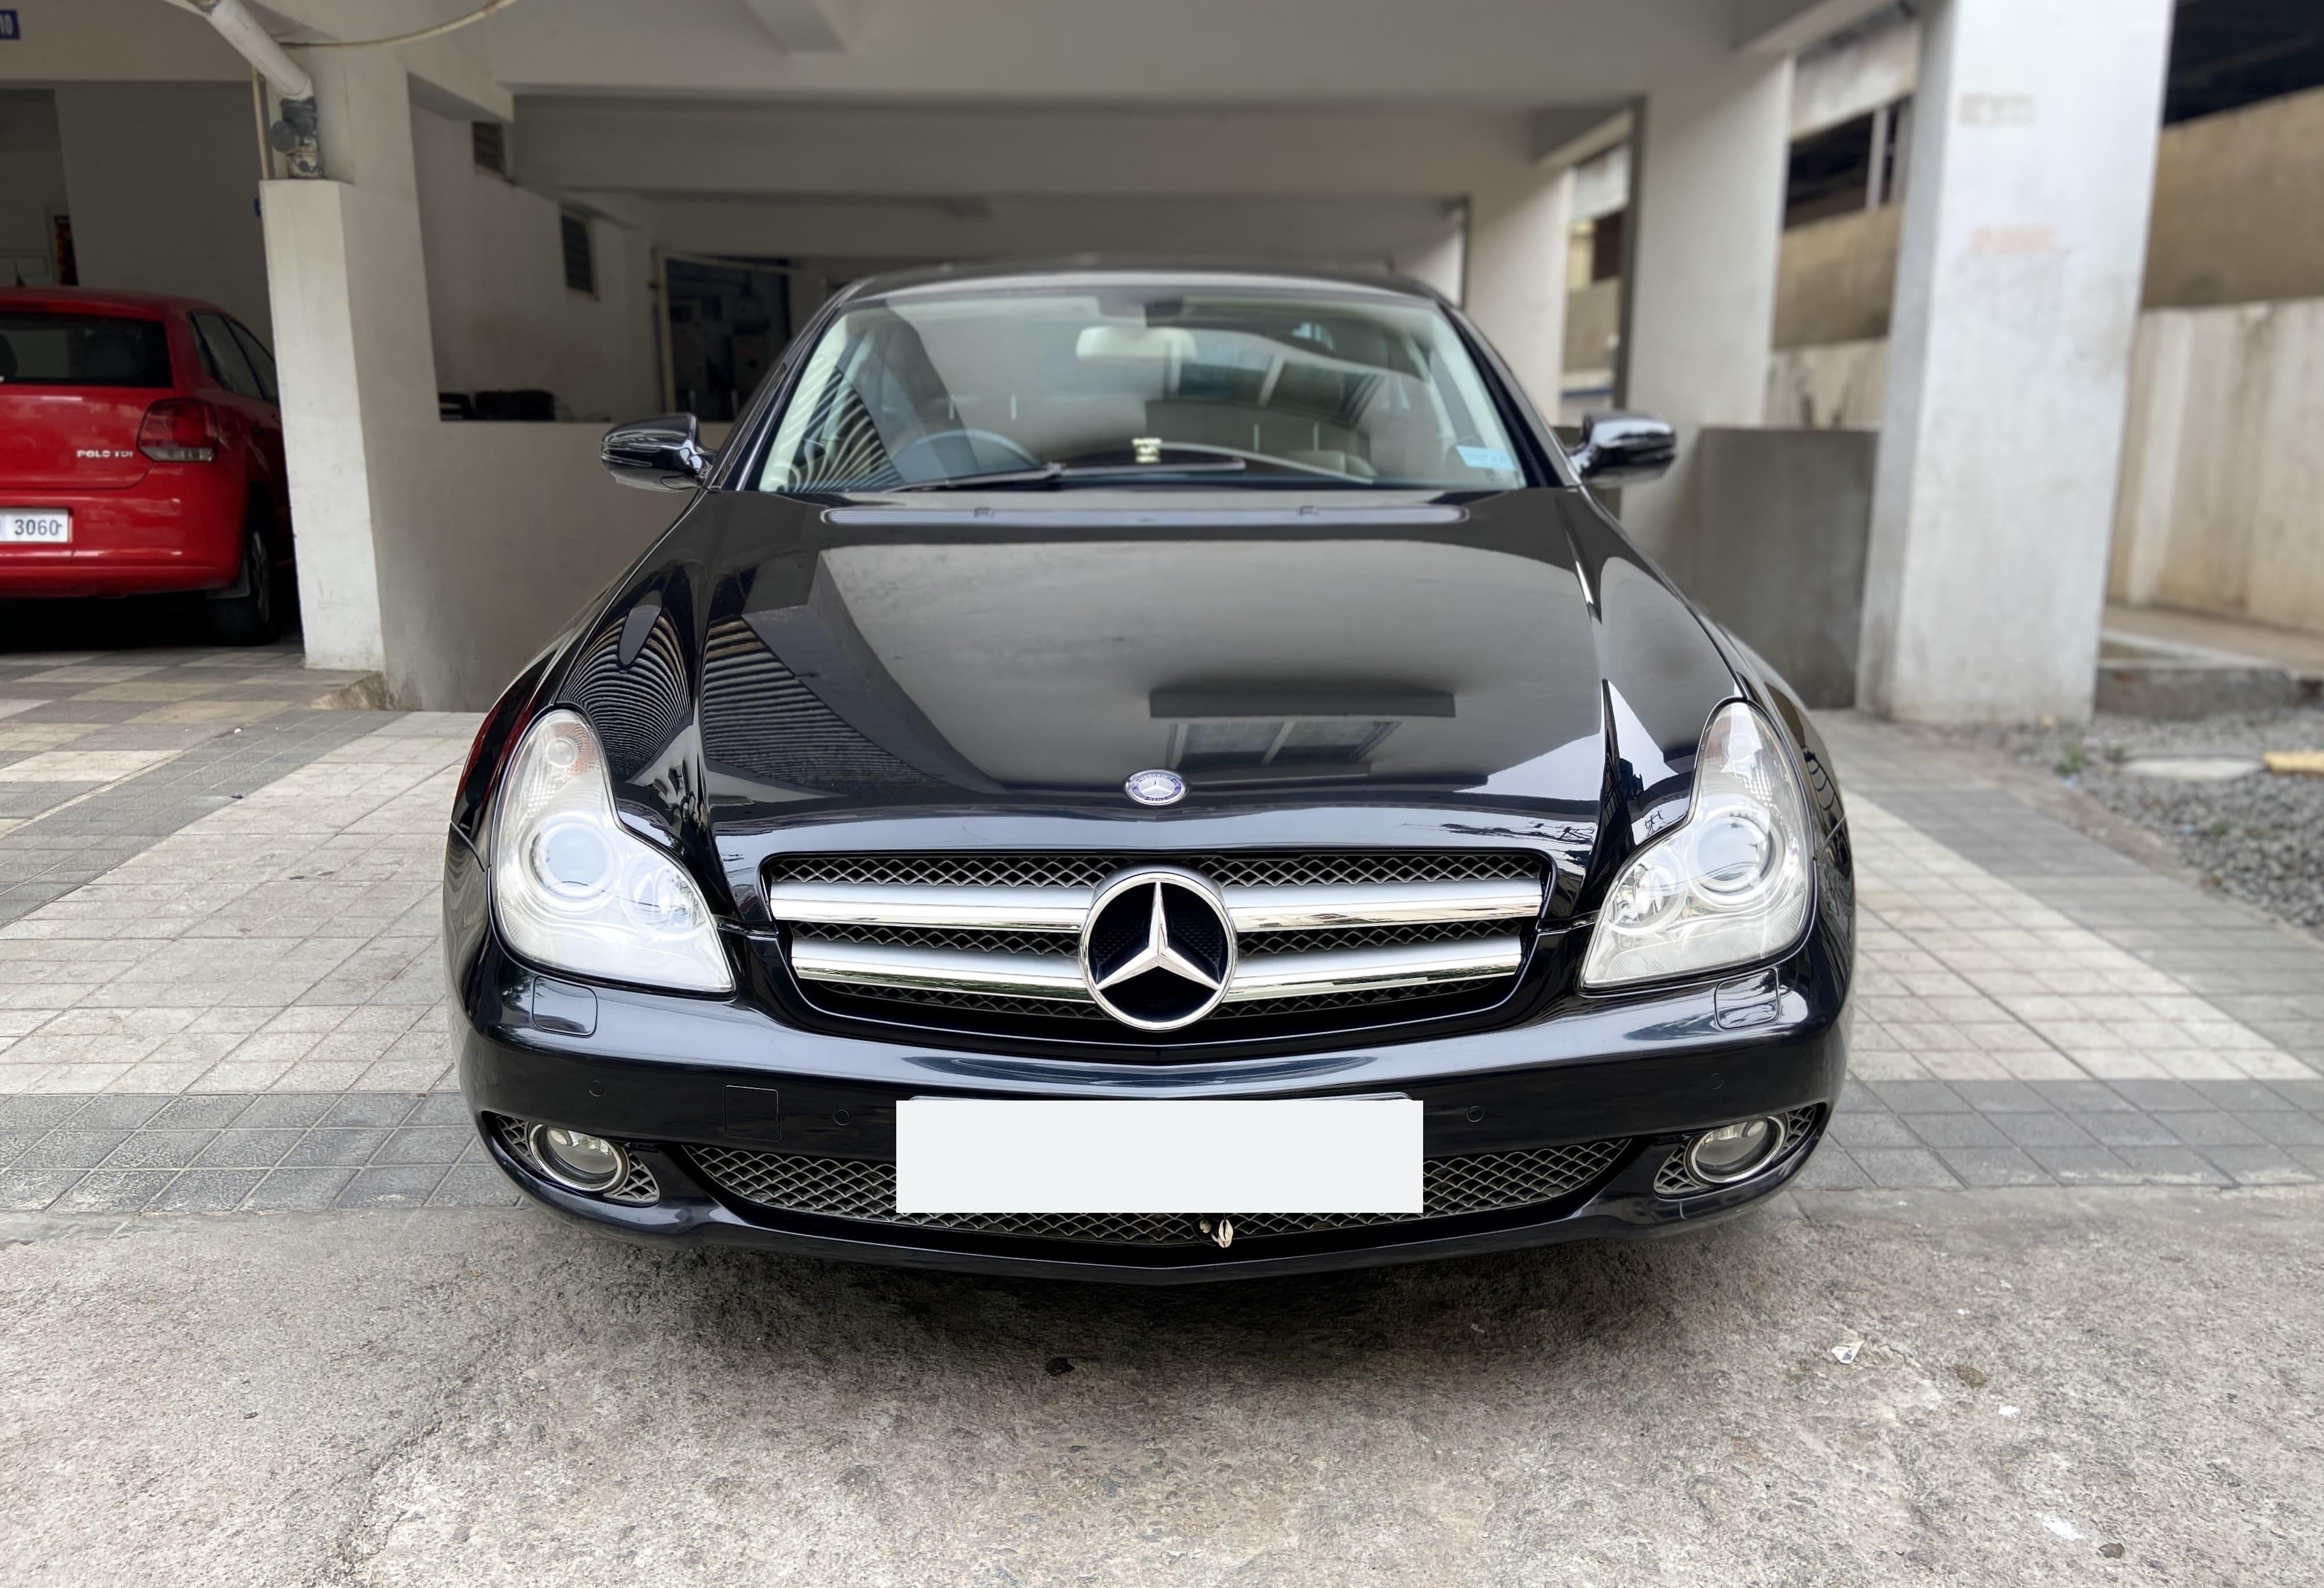 Mercedes-Benz CLS-Class 2006-2010 350 CDI